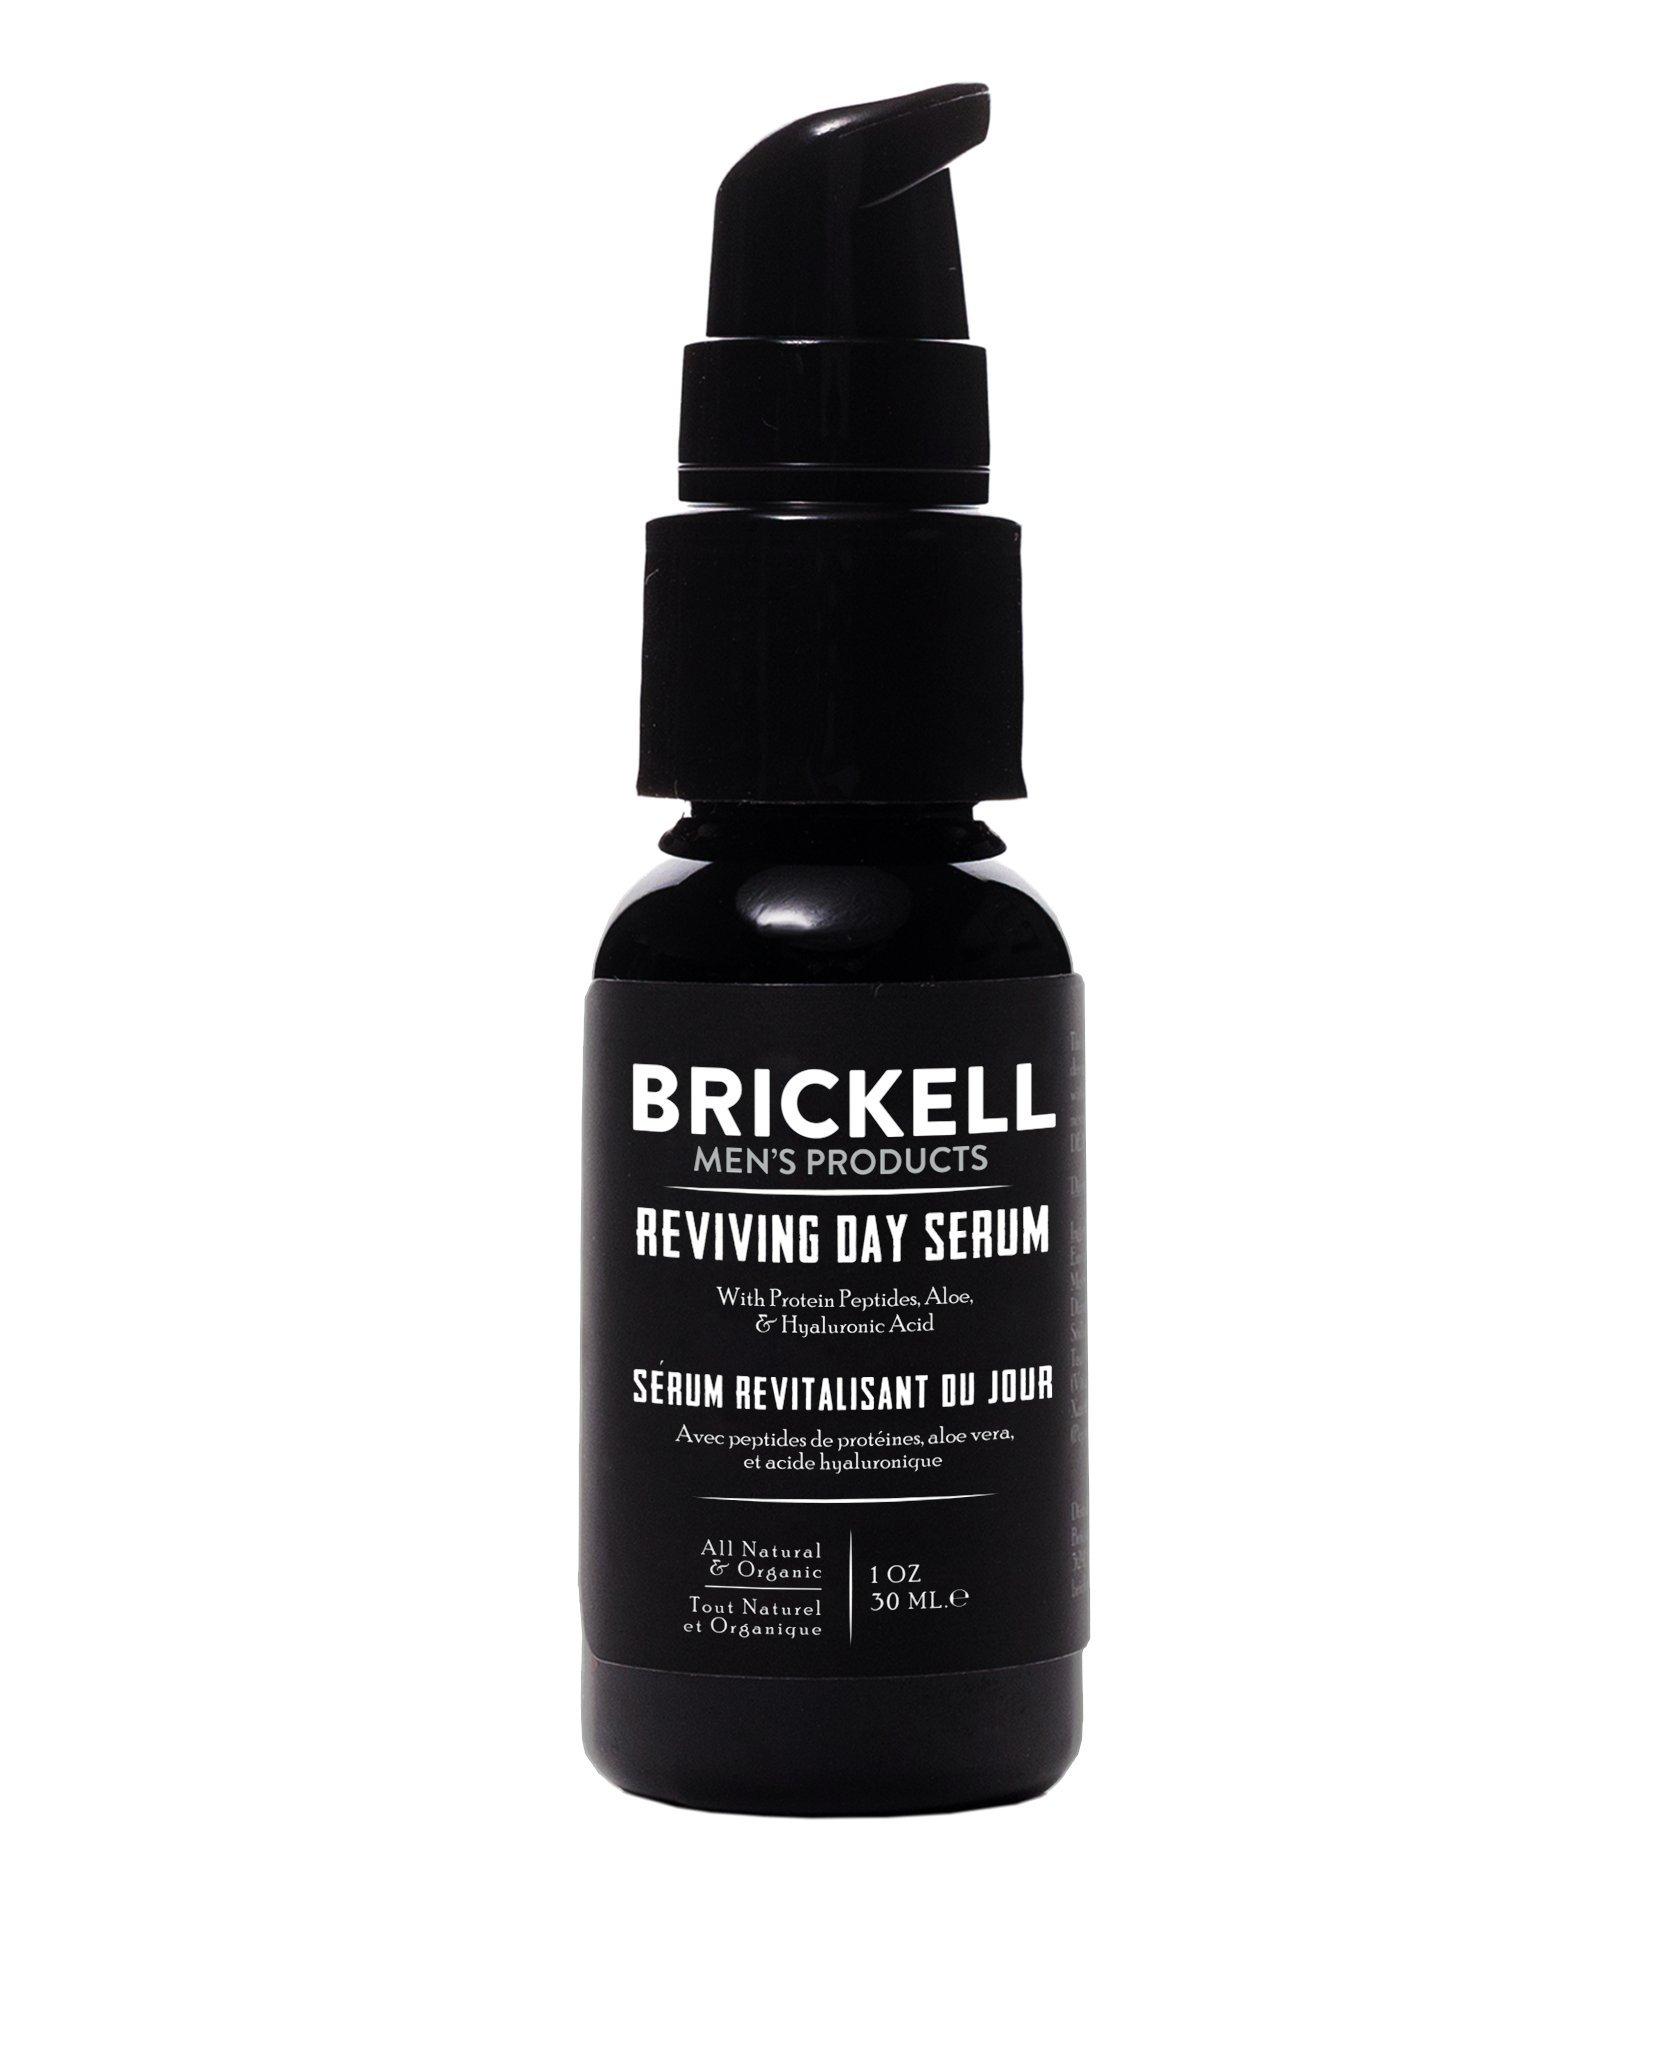 Brickell Men's Anti Aging Reviving Day Serum for Men – Natural & Organic - 1 oz - Scented